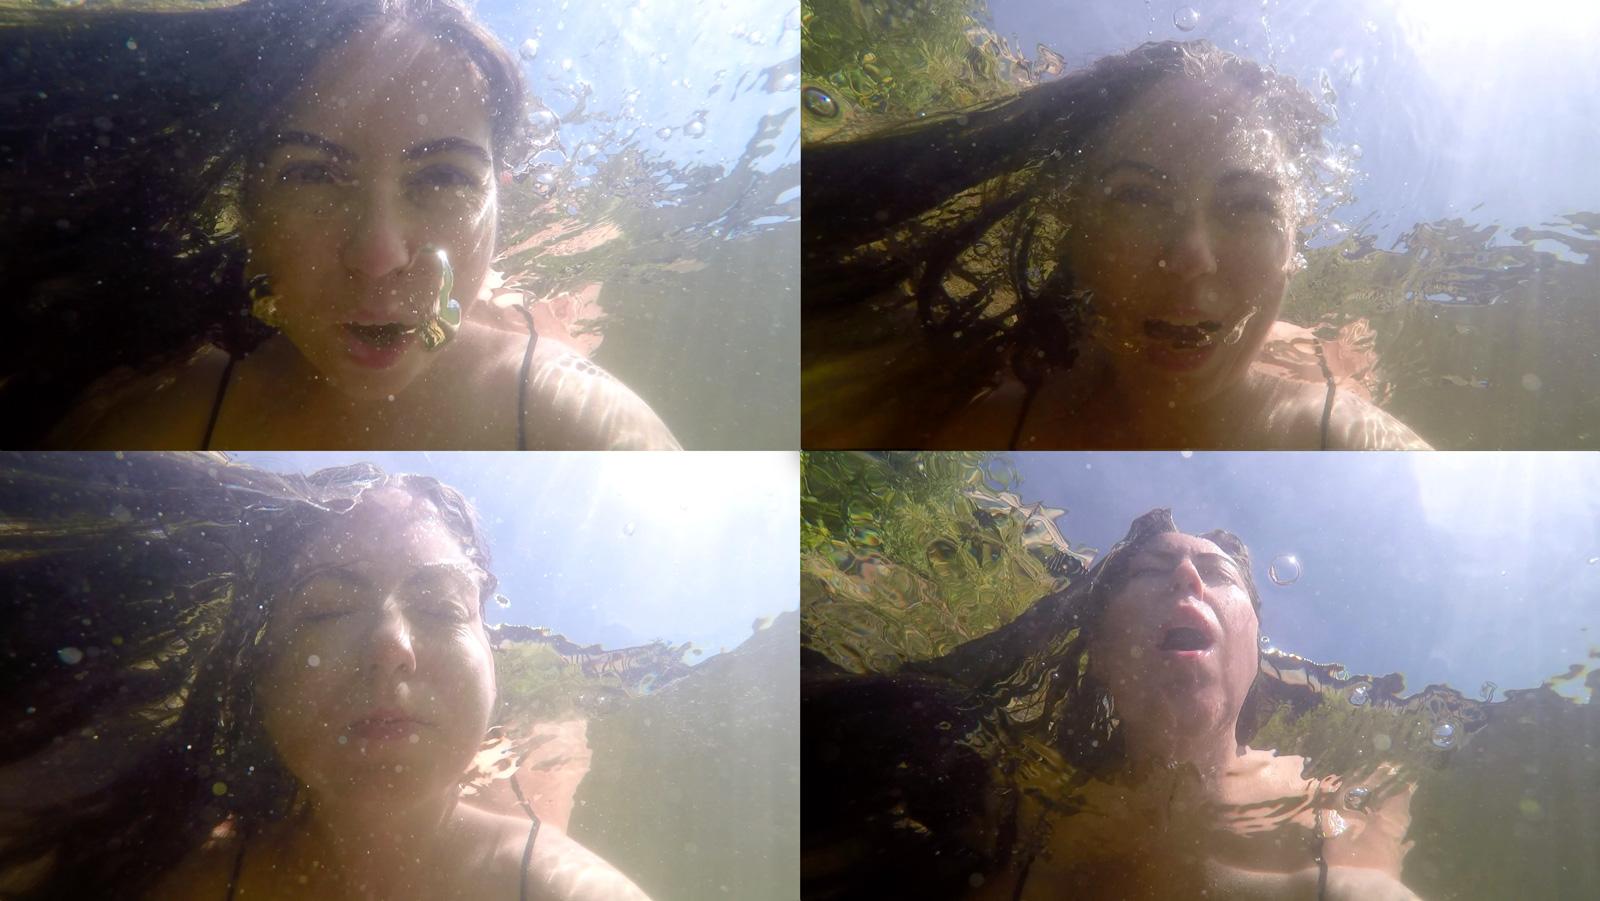 Stills from single-channel video.